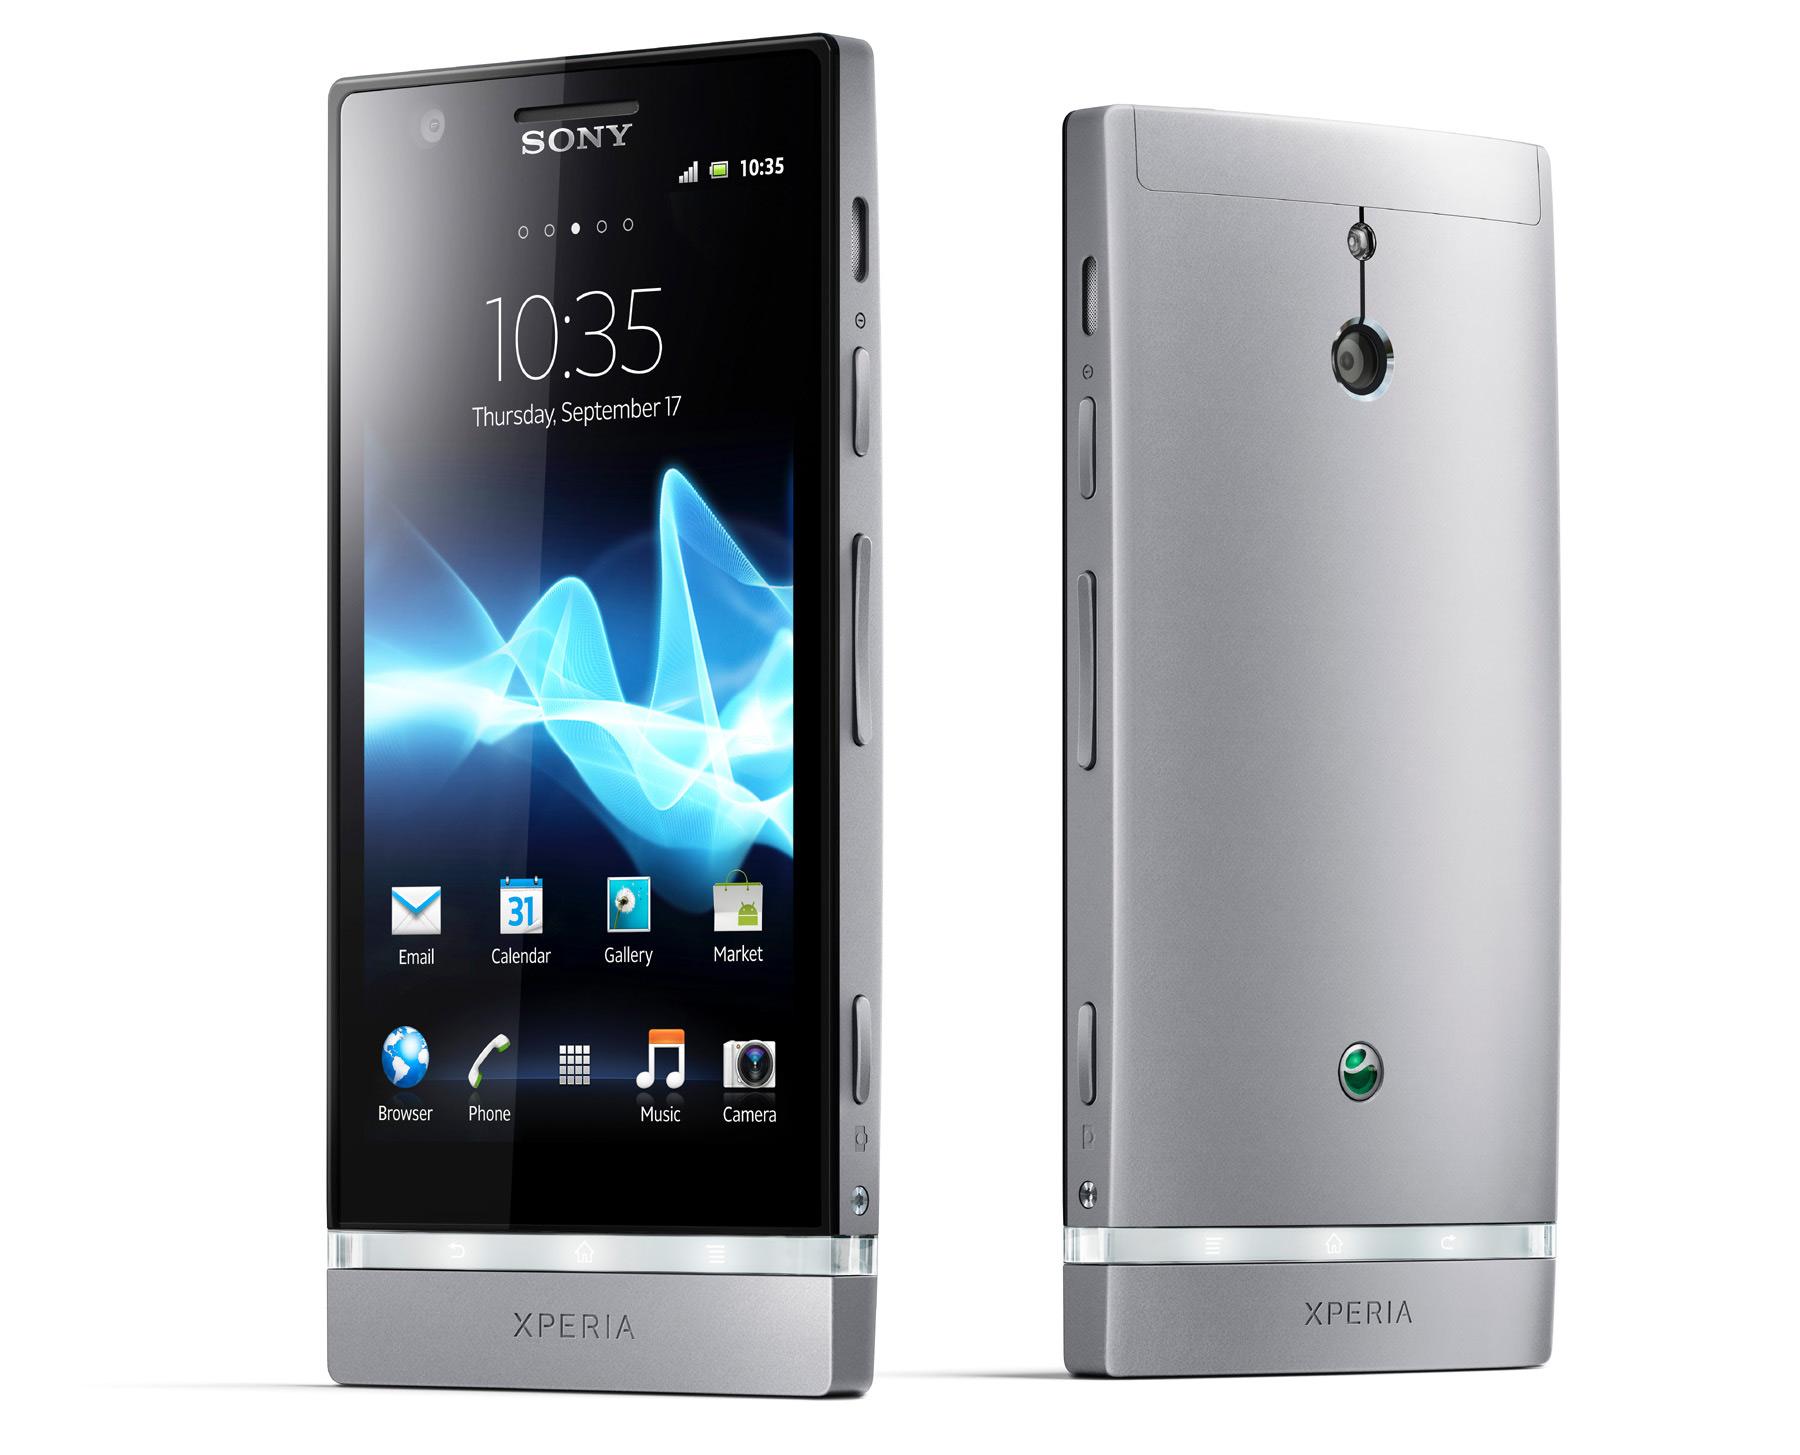 Sony Xperia P - Specs and Price - Phonegg